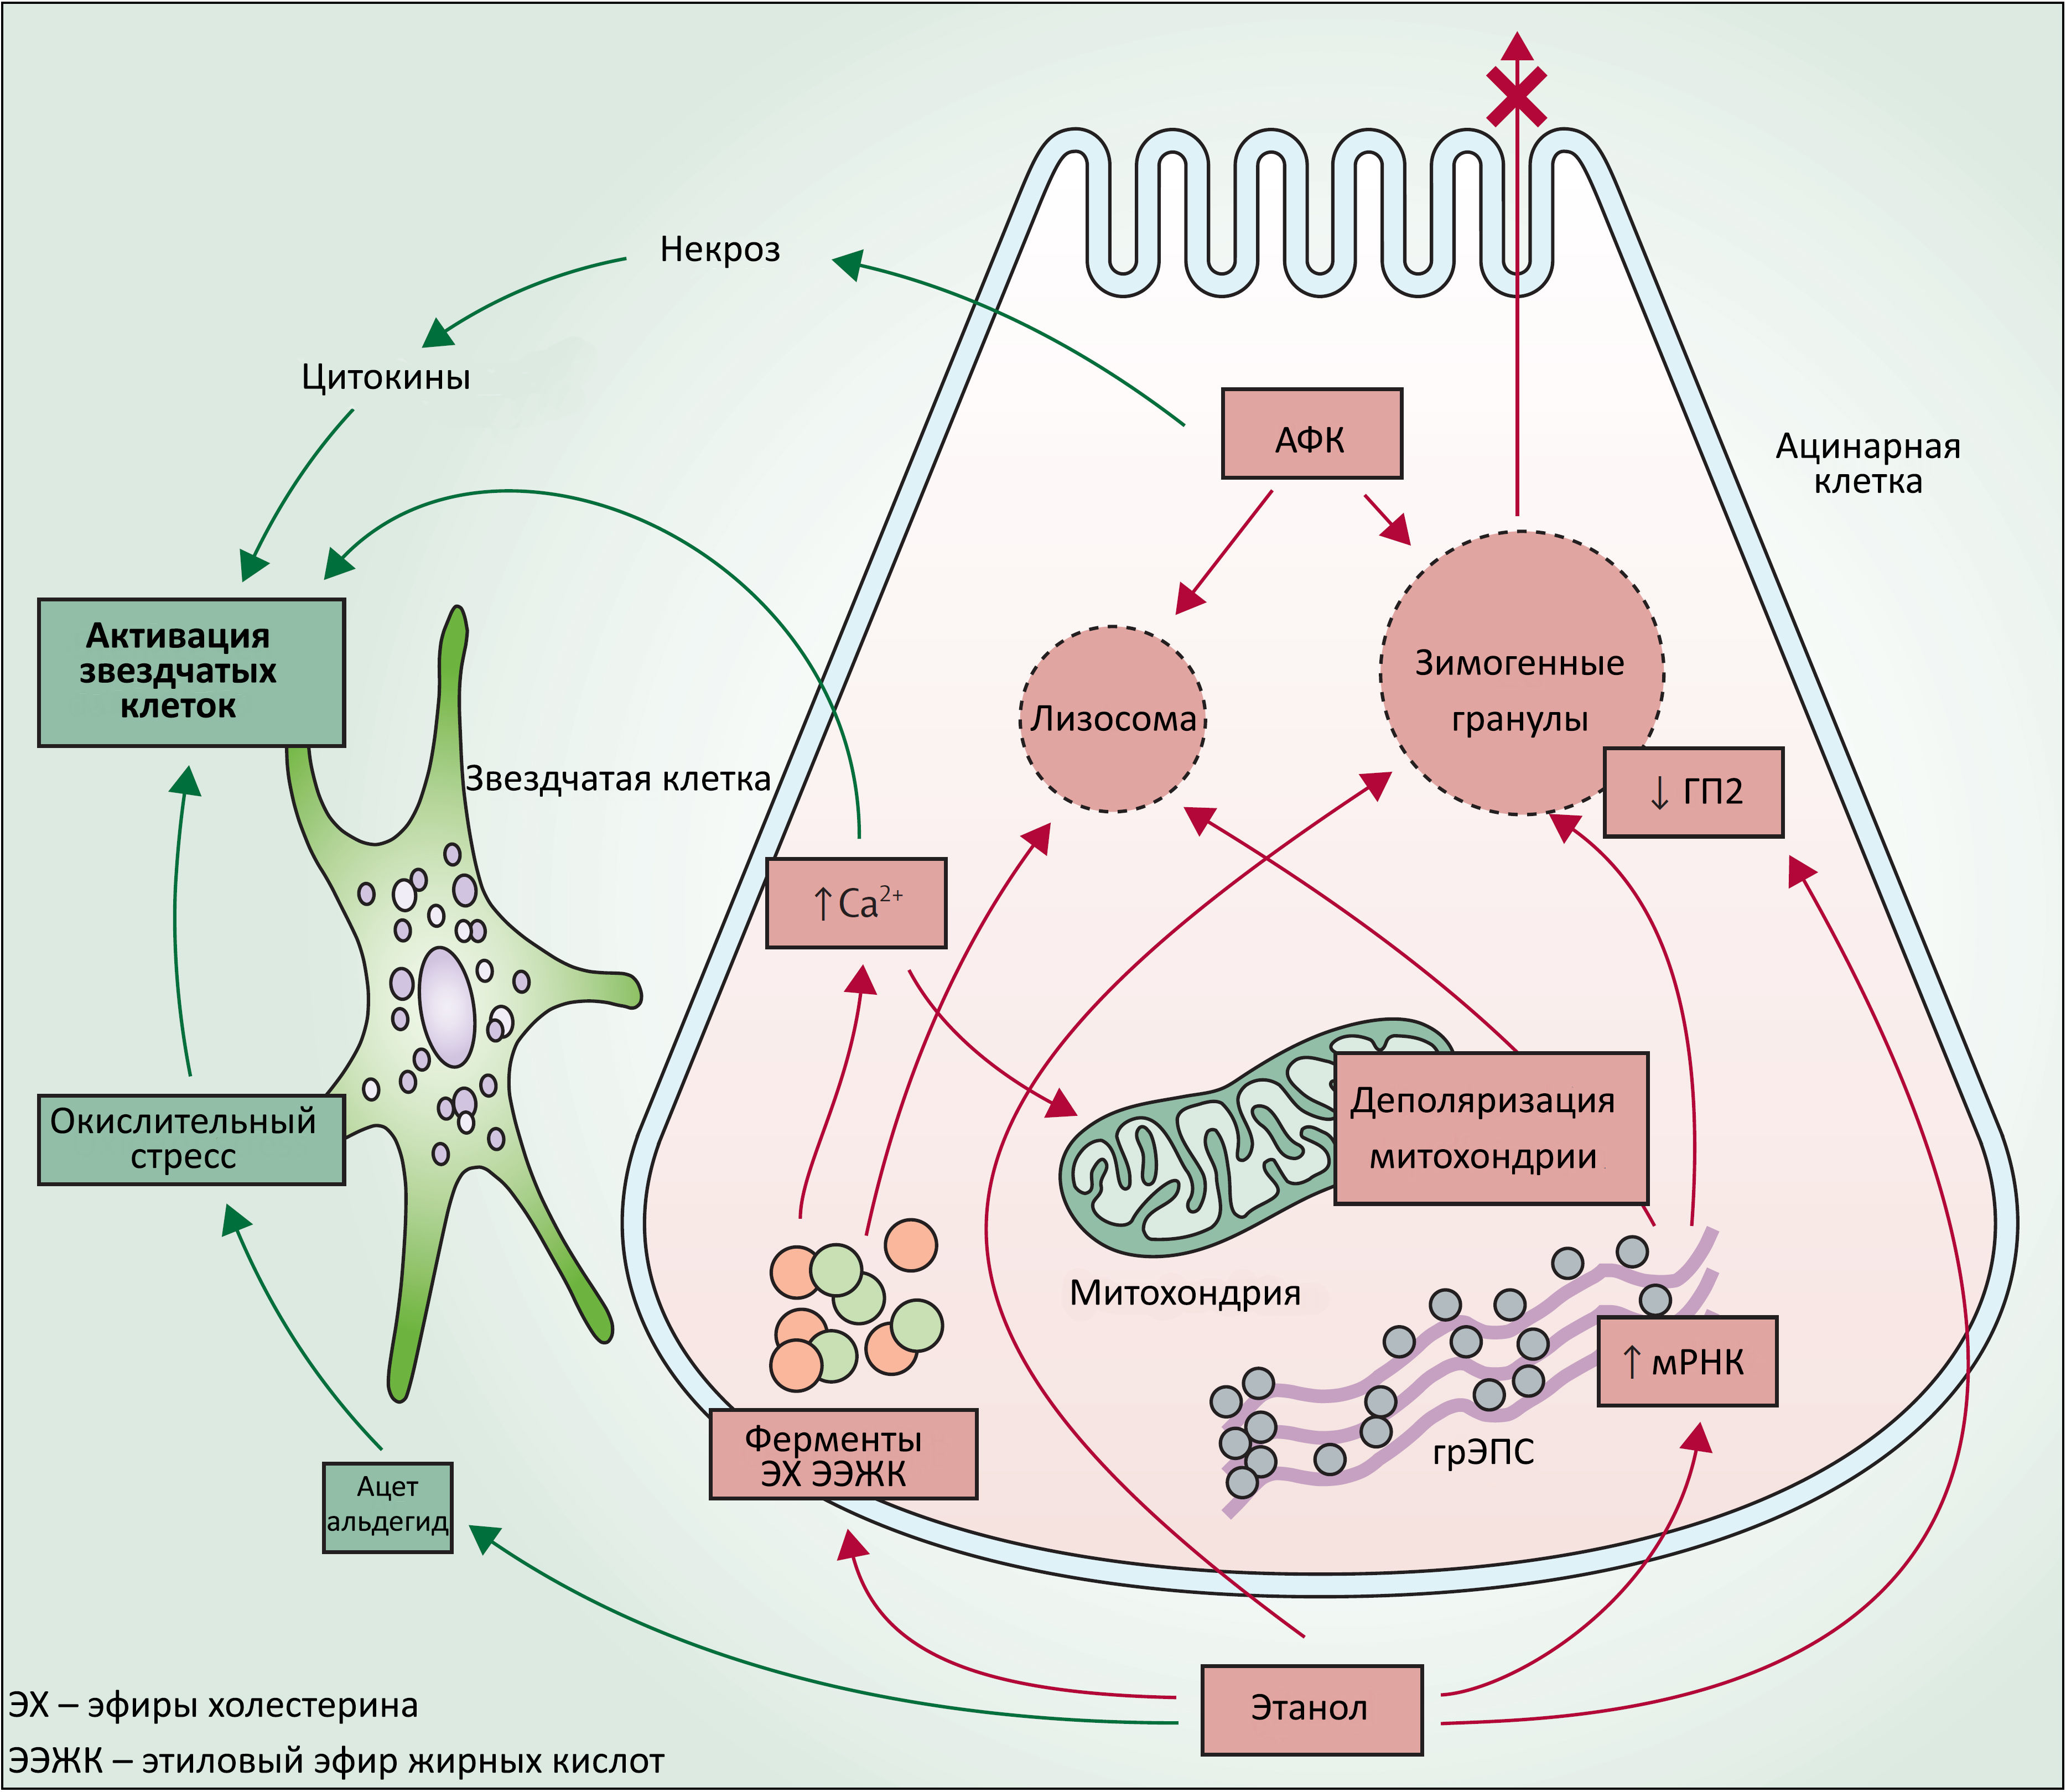 Теории и гипотезы патогенеза хронического панкреатита